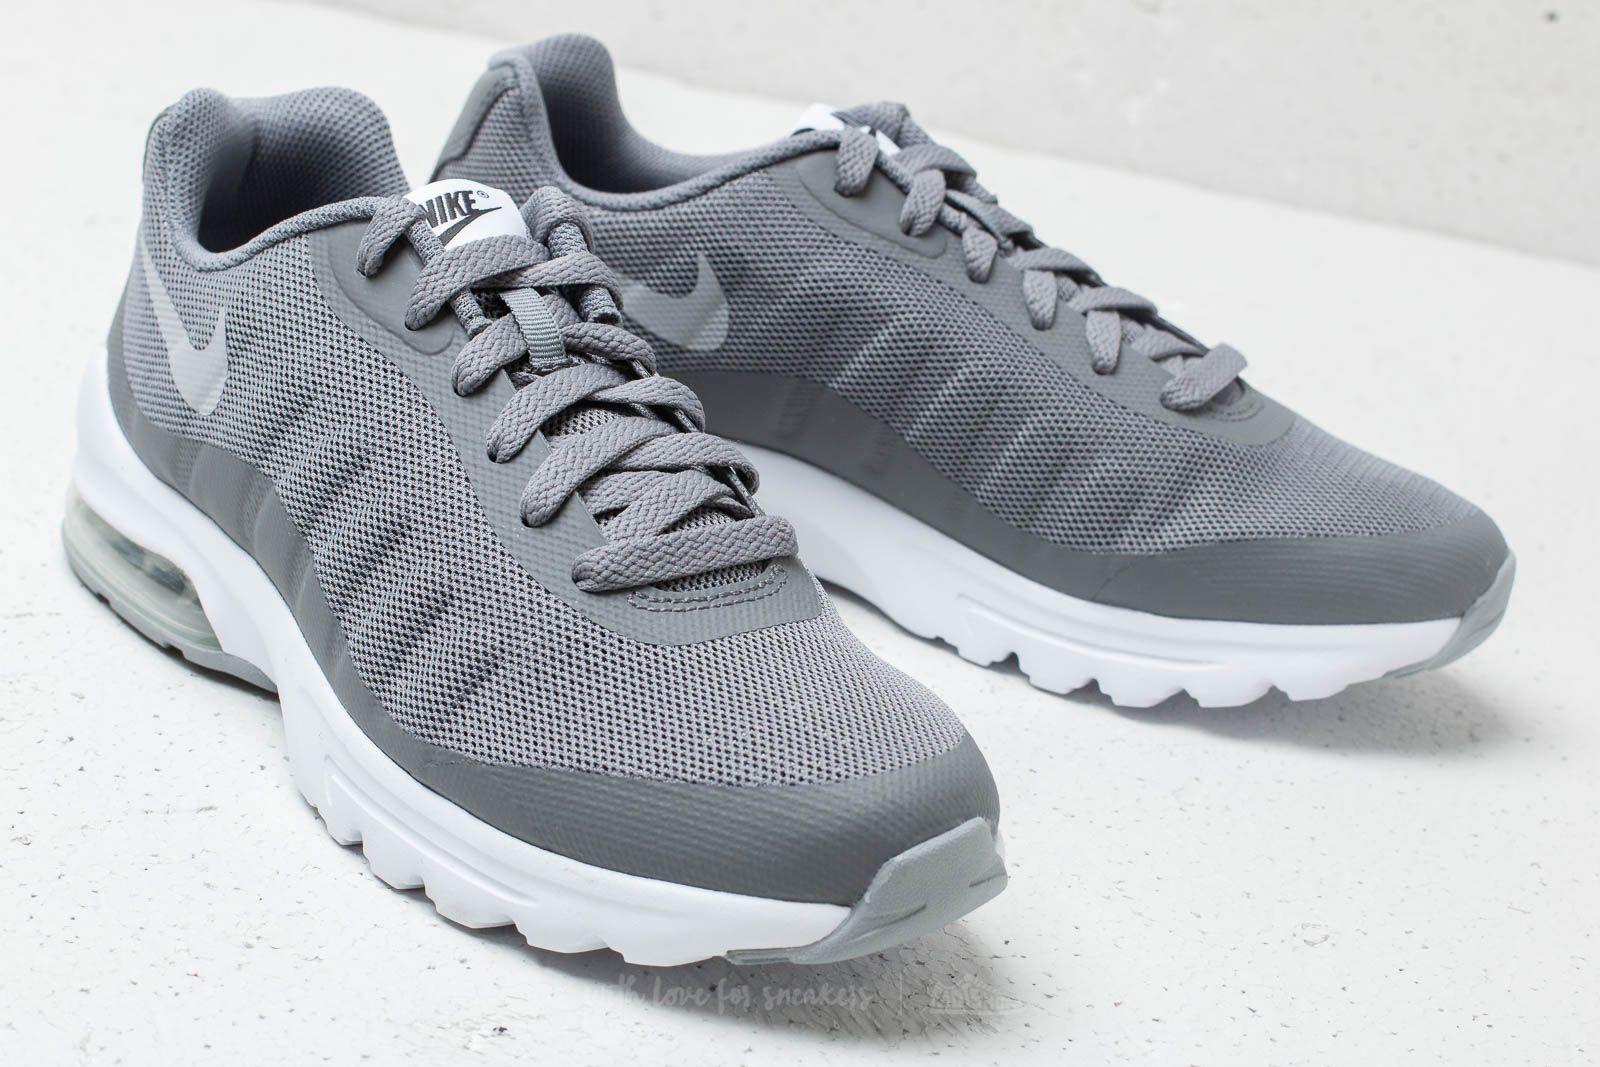 Nike Air Max Invigor (GS) Cool Grey Wolf Grey Anthracite | Footshop